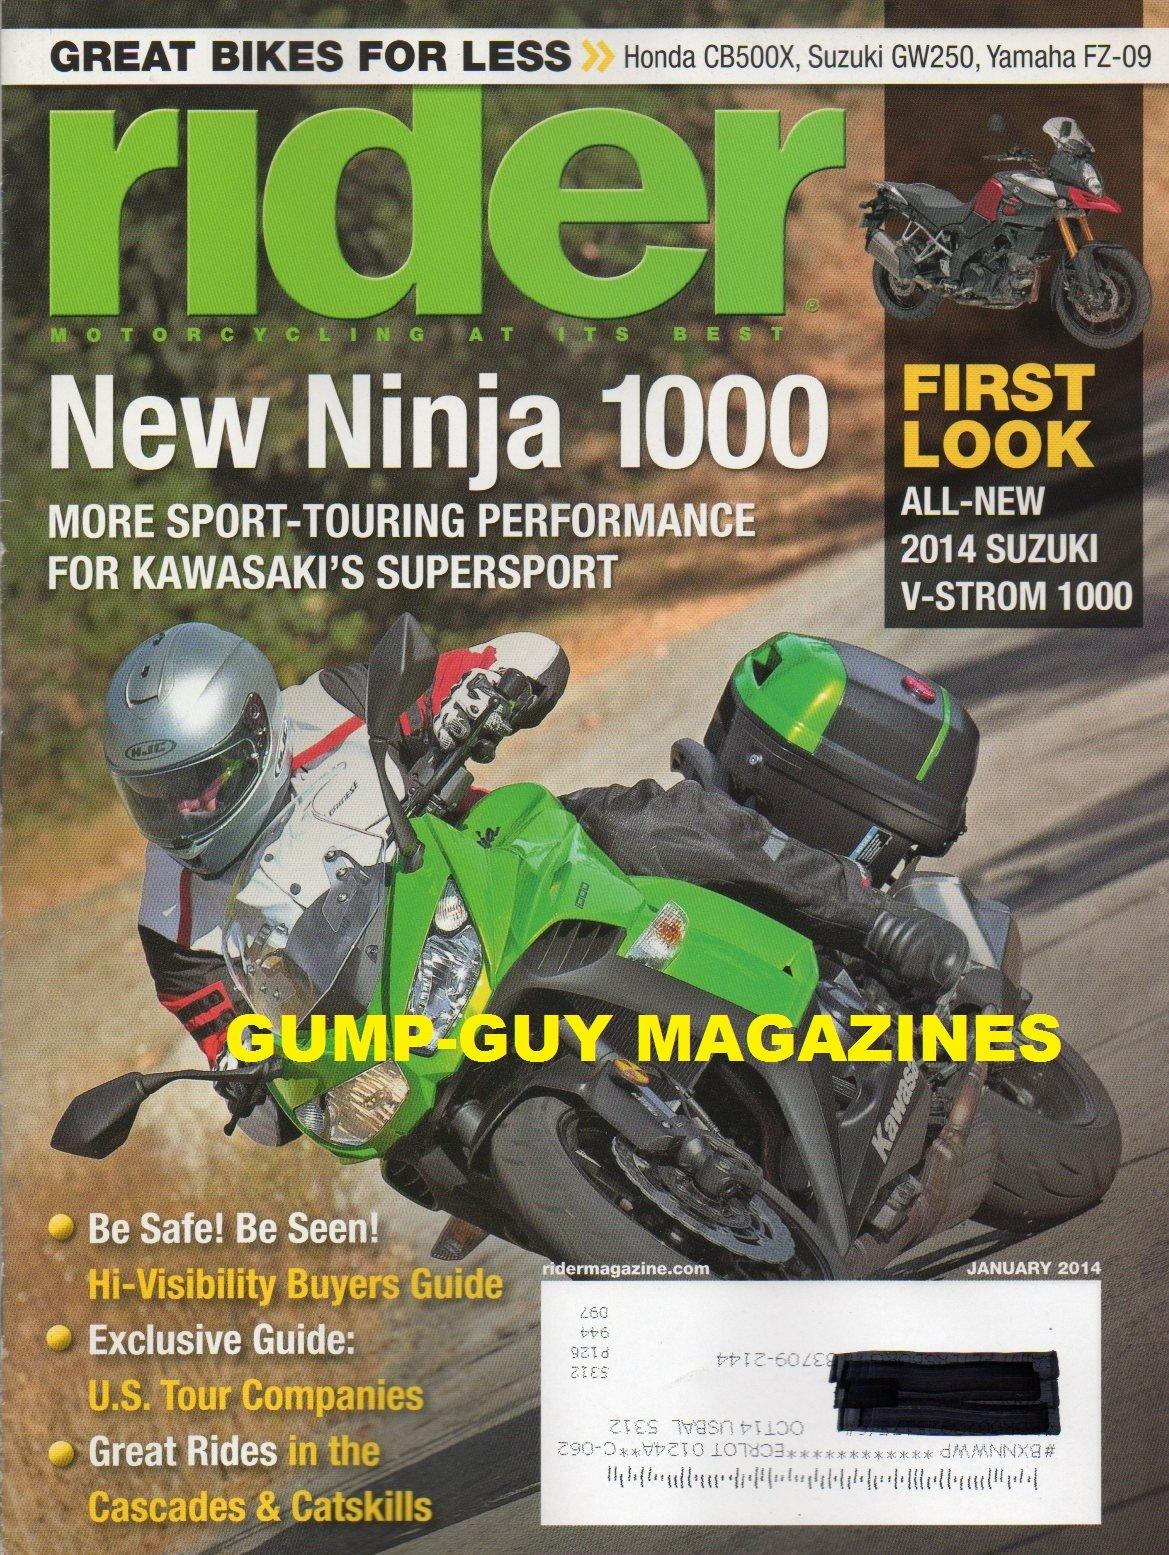 Download Rider Magazine January 2014 GREAT BIKES FOR LESS: HONDA CB500X, SUZUKI GW250 YAMAHA FZ-09 New Ninja 1000 More Sport-Touring Performance For Kawasaki's Supersport ALL-NEW SUZUKI V-STORM 1000 pdf